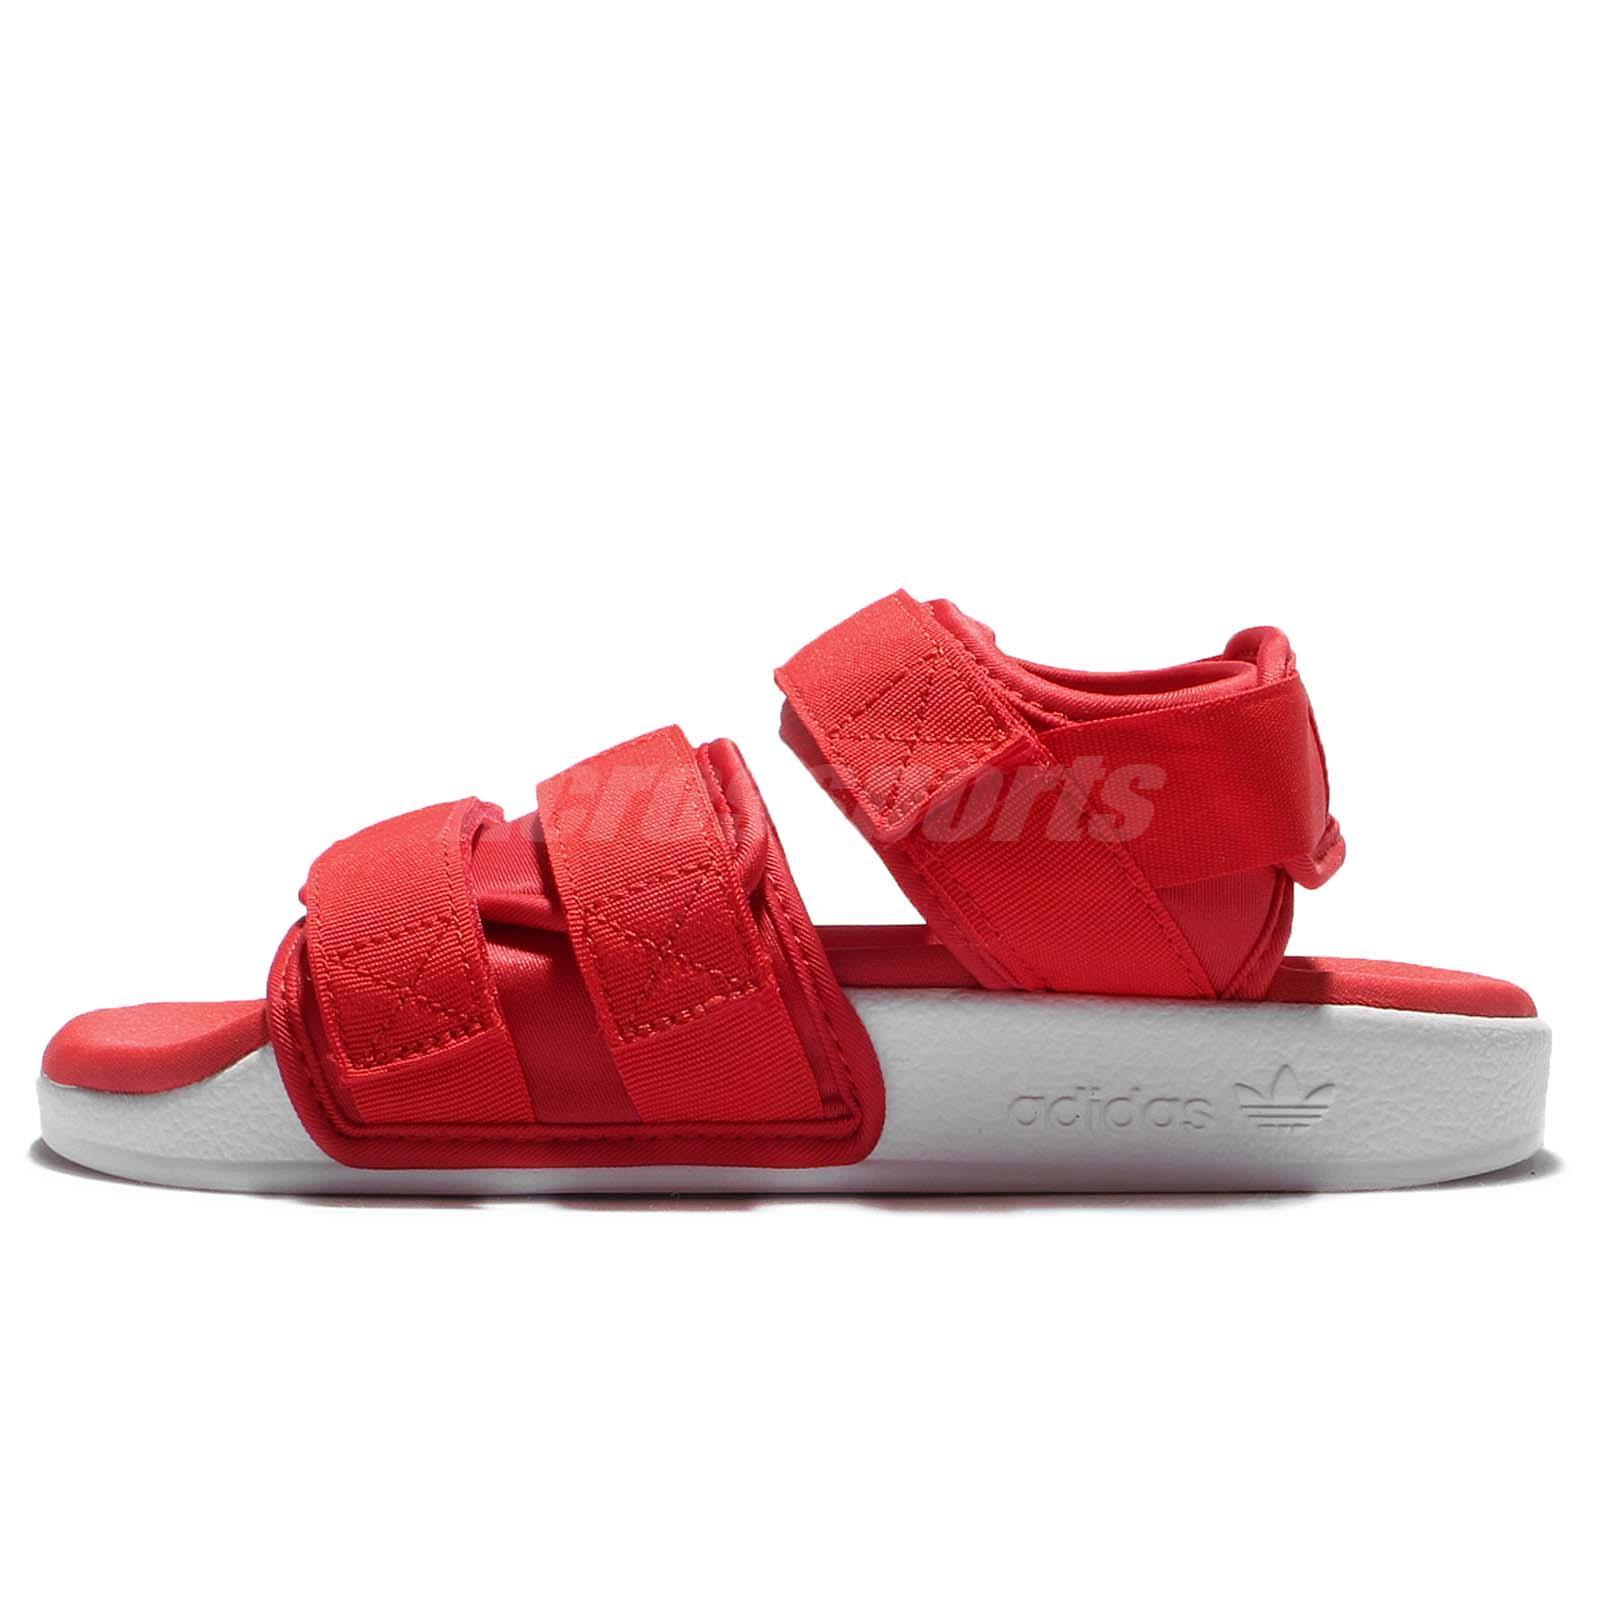 Adidas Originals Adilette Flip Flops On Sale Off30 Discounted Sendal Original